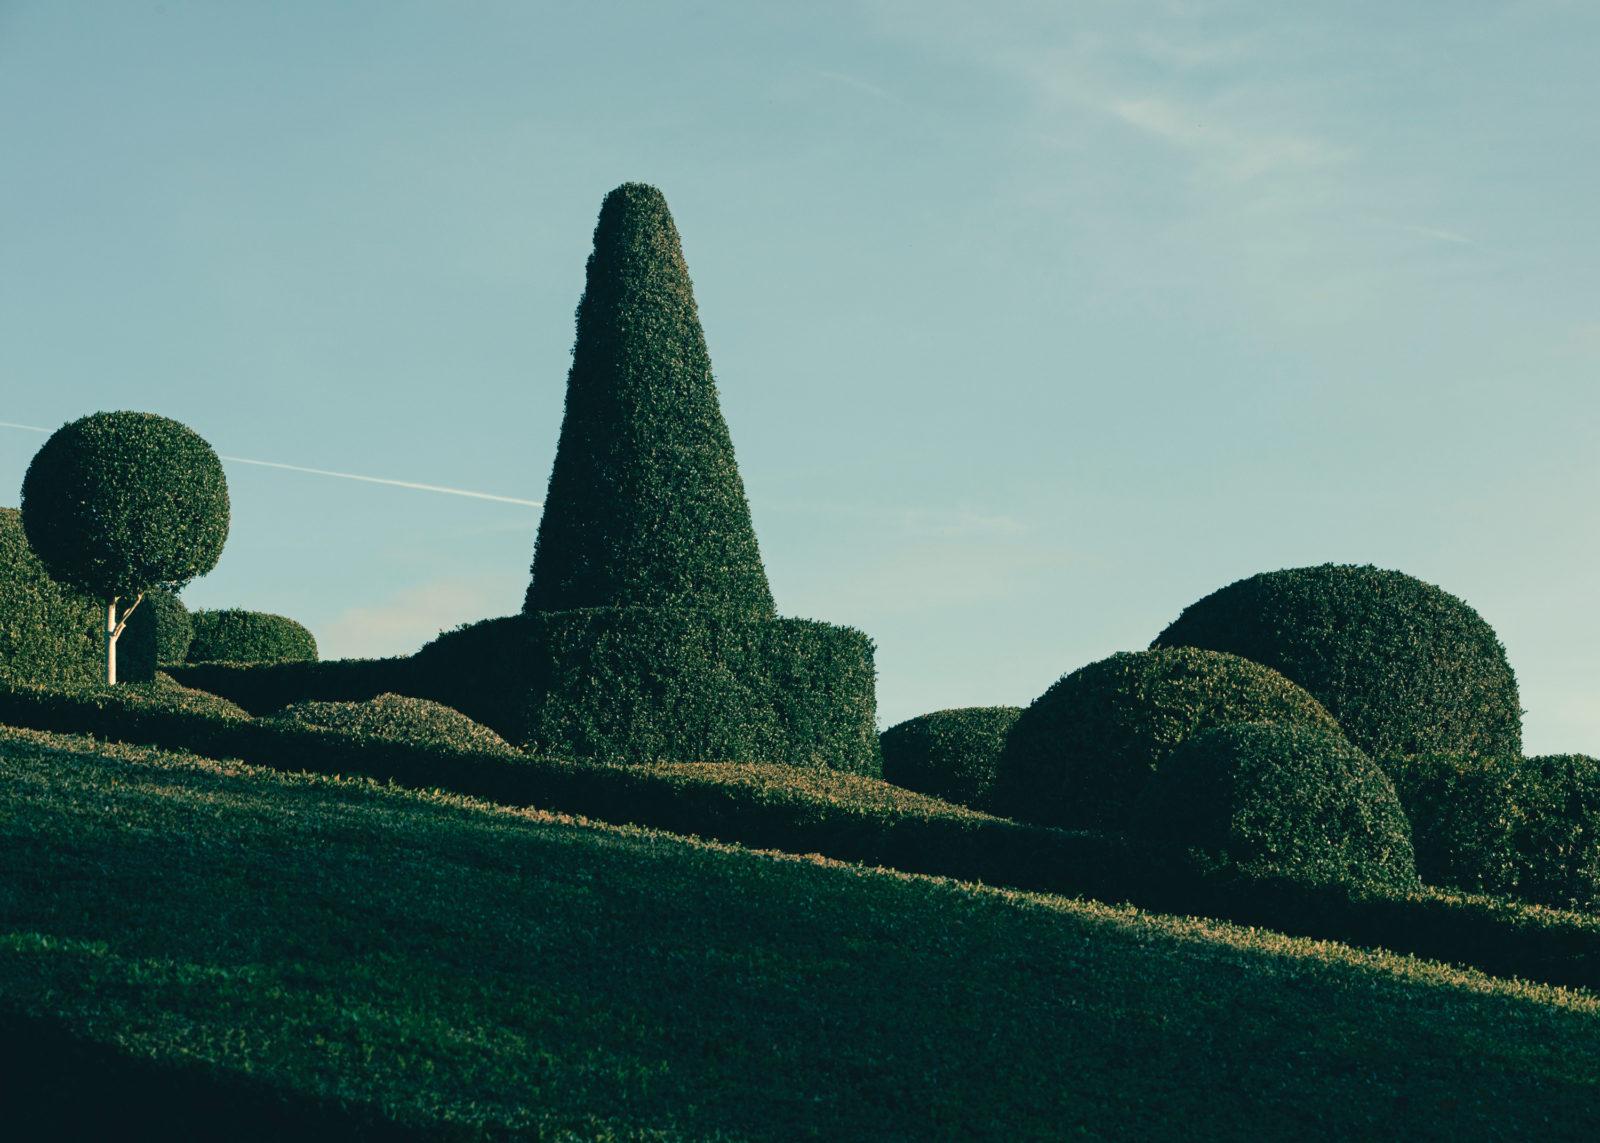 Les Jardins de Marqueyssac 04 1600x1143